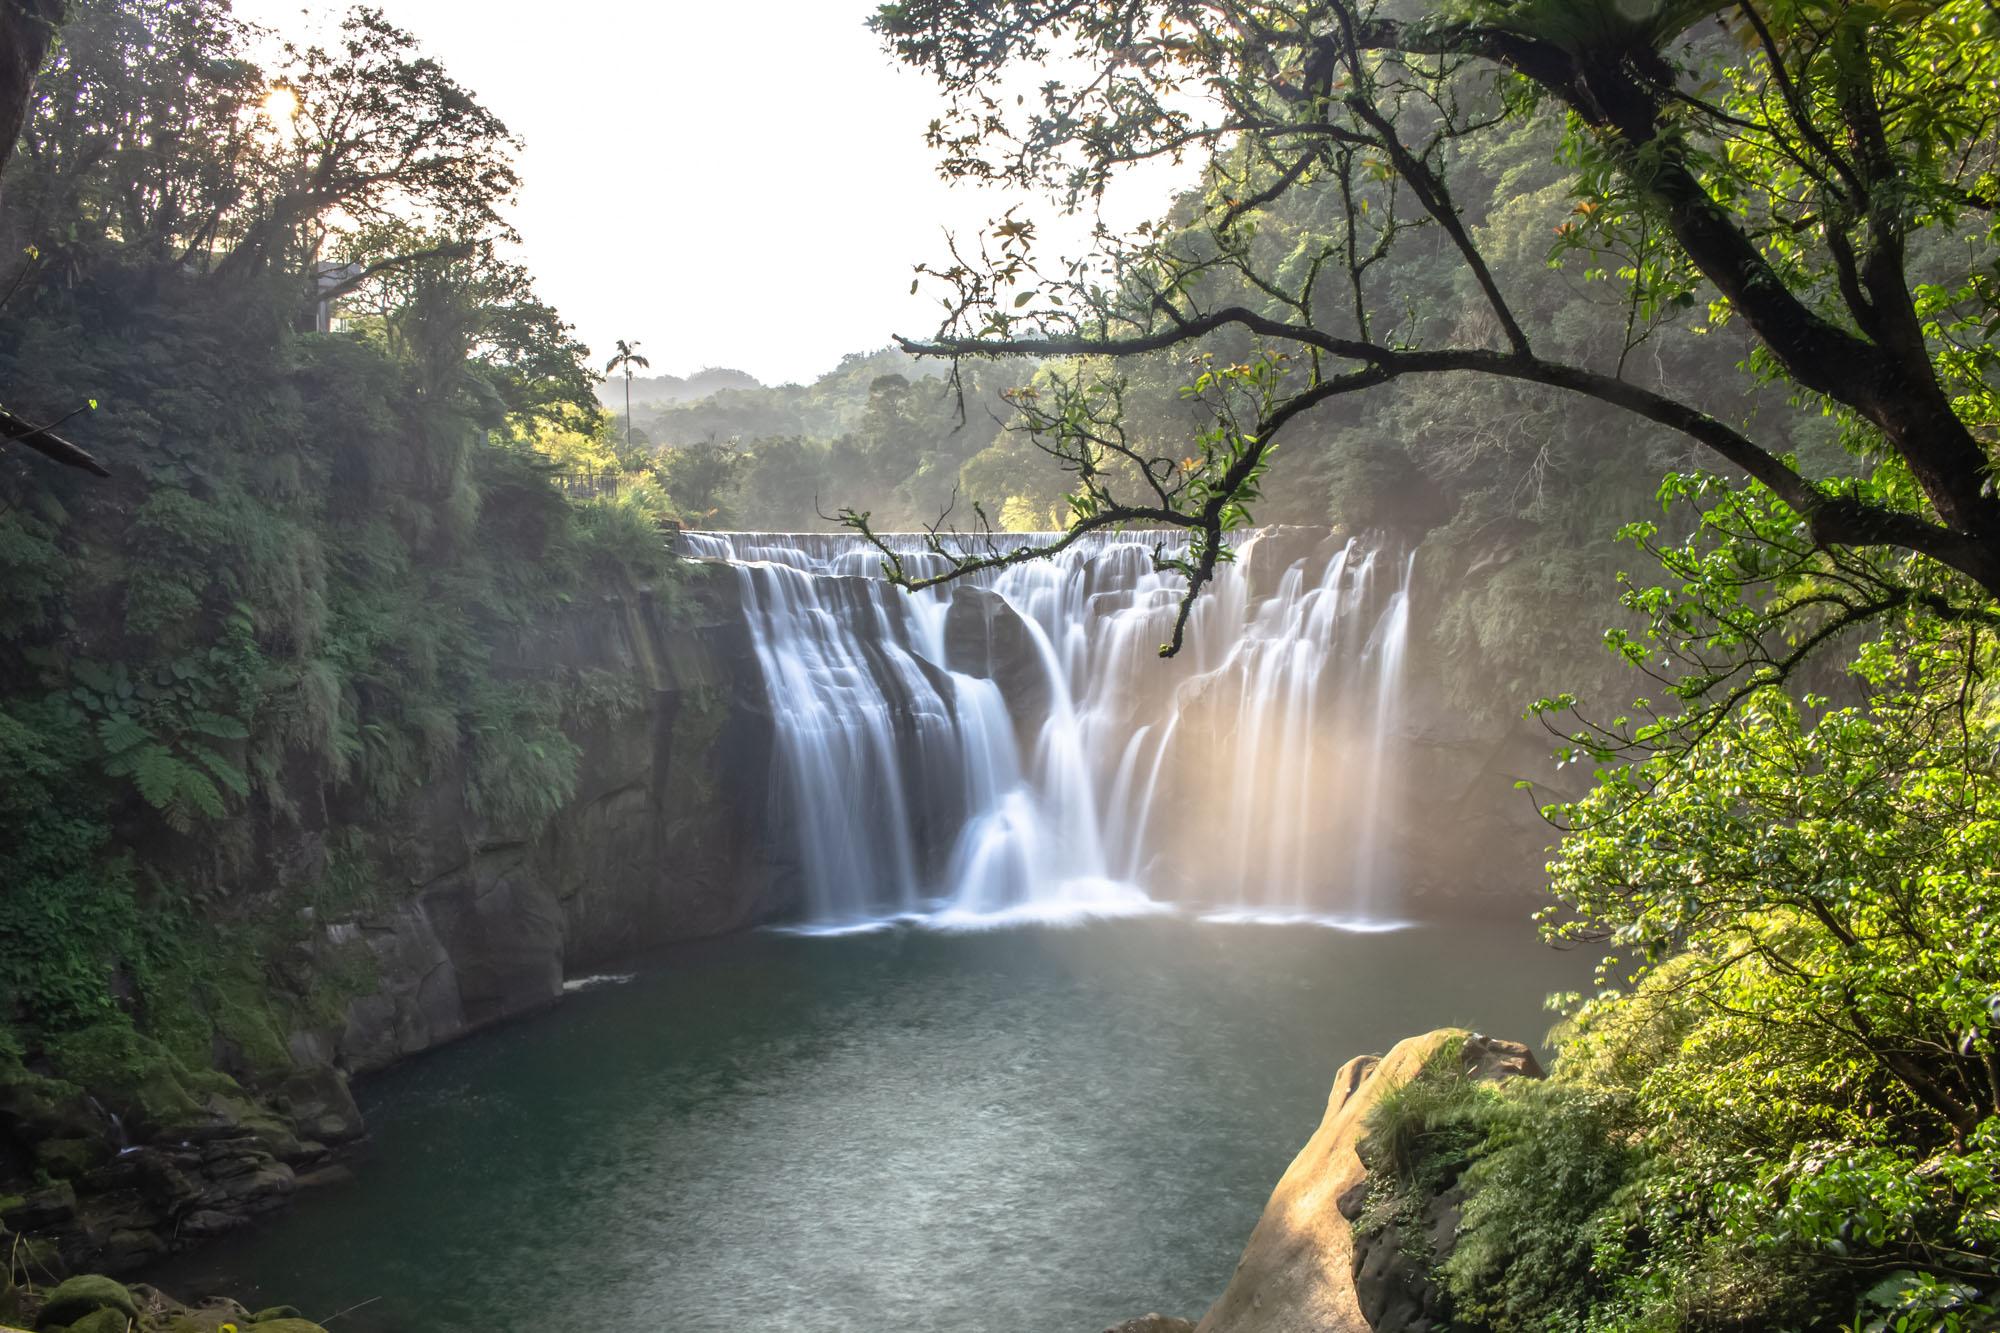 【Taipei Day Tour】Jiufen Old Street & Shifen Waterfall